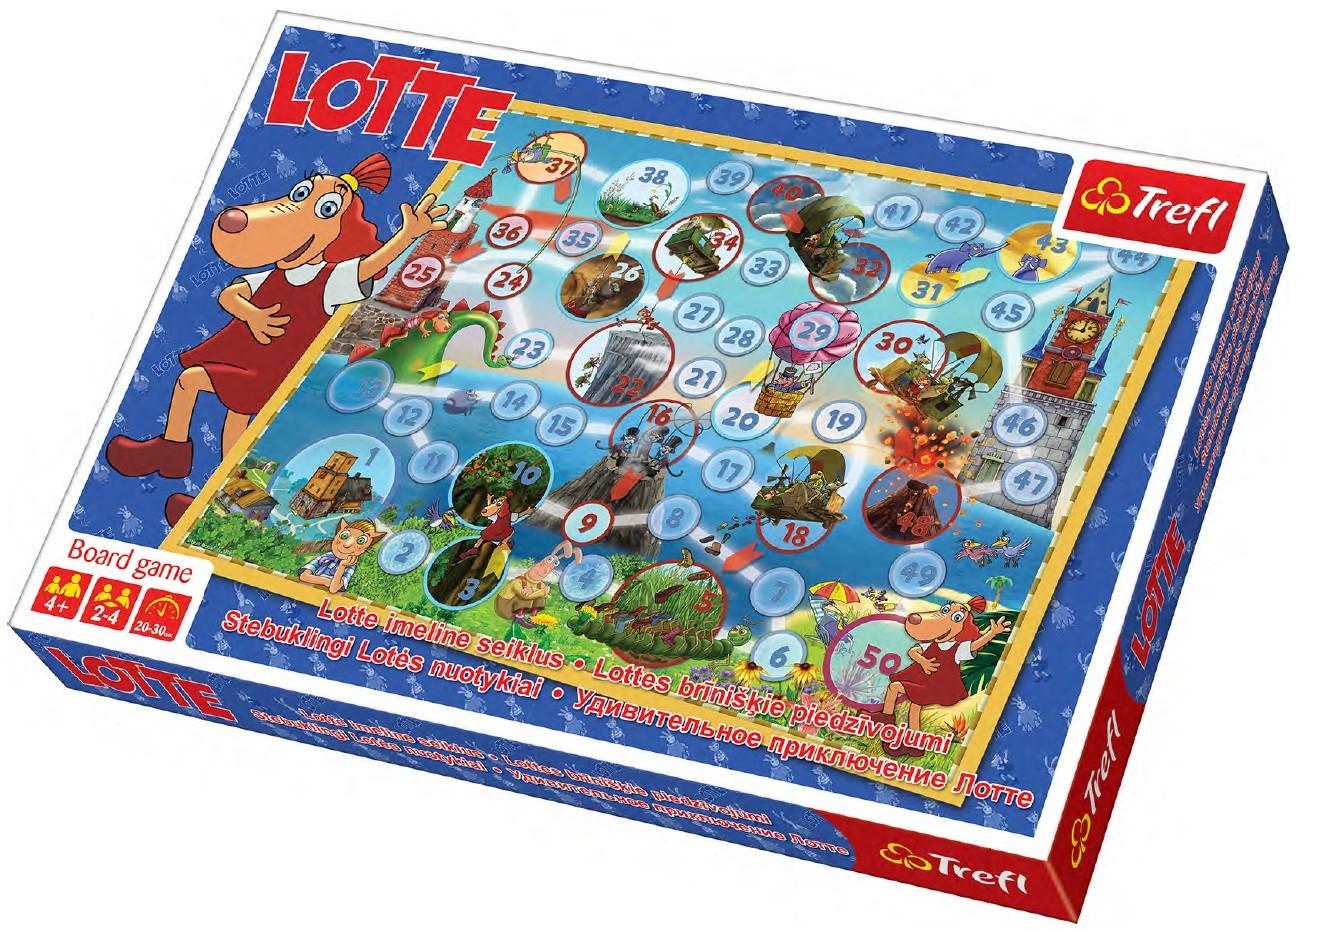 TREFL Lotte lauamäng